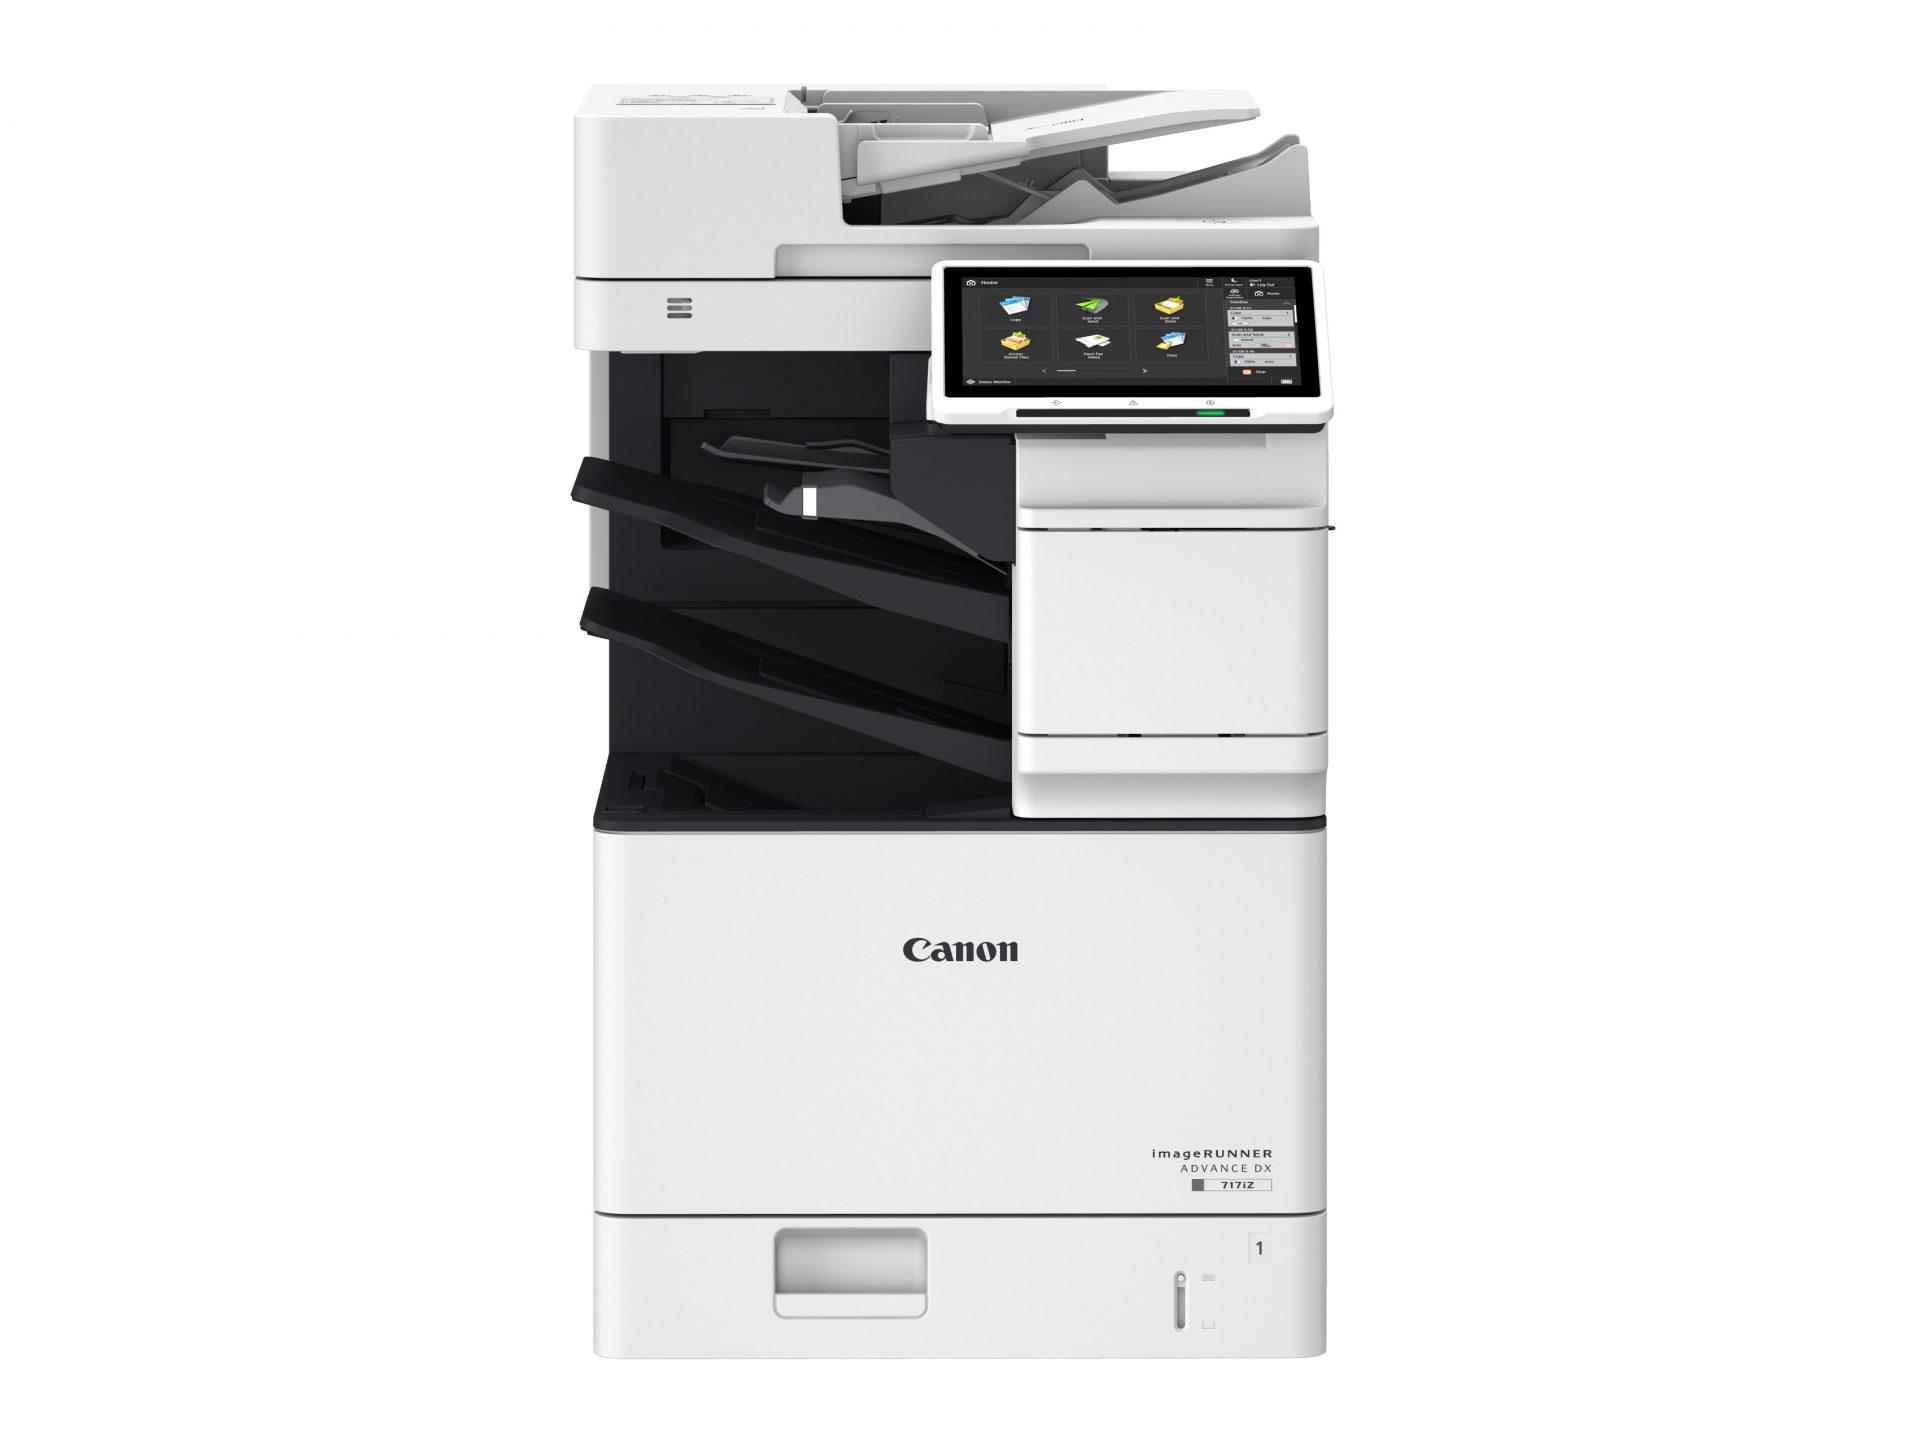 Office multifunction printer Imagerunner Advance DX 717